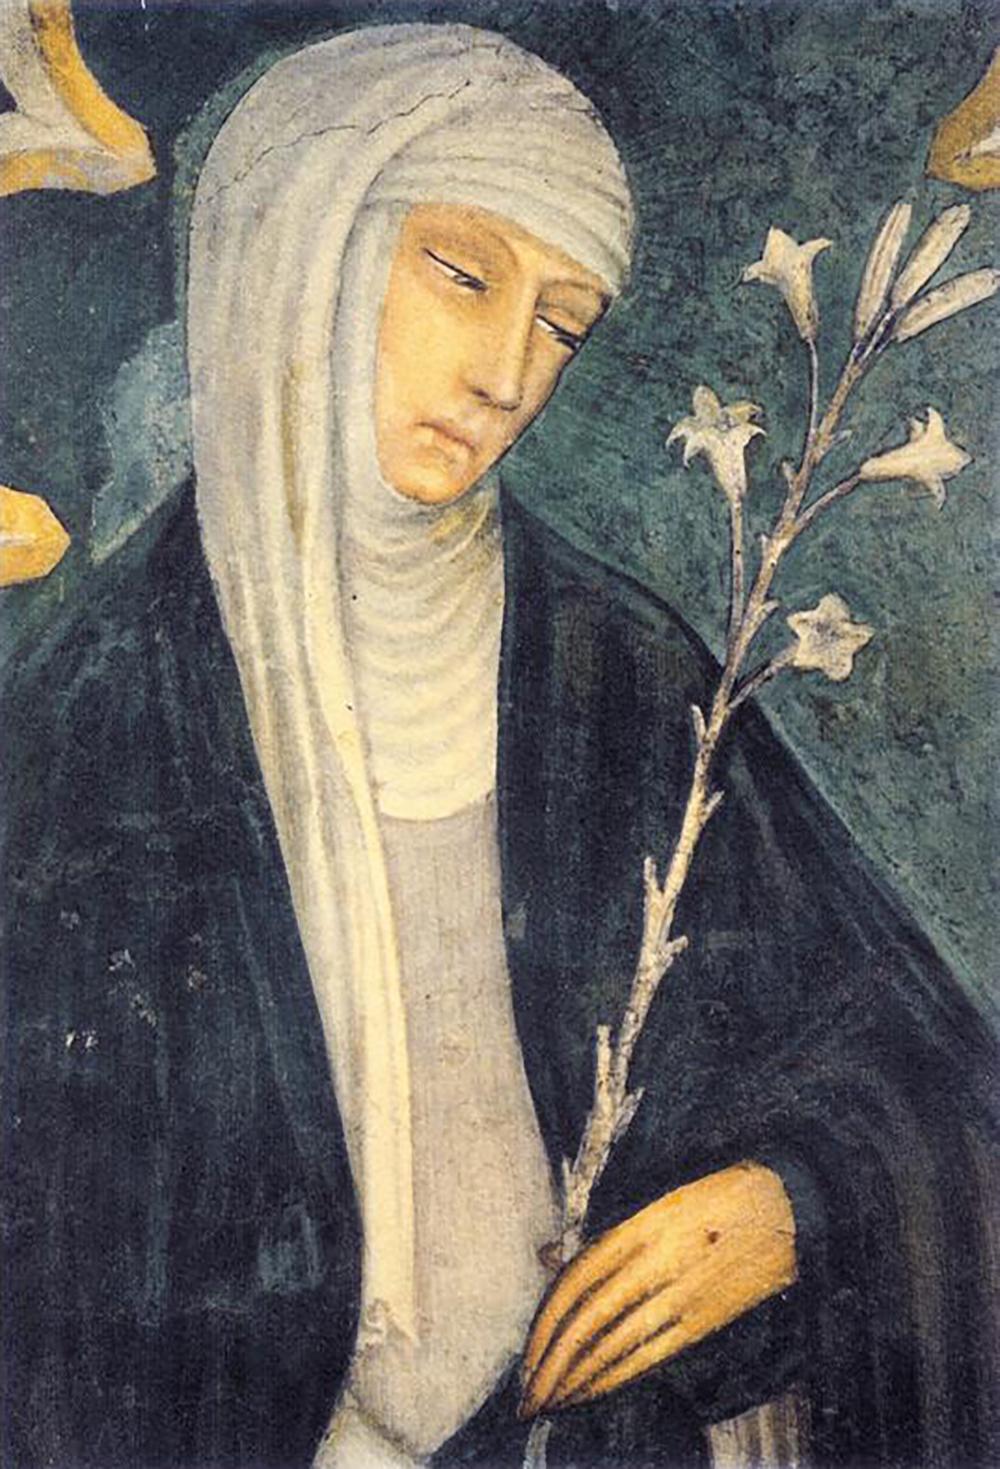 St. Catherine of Siena, pray for us.